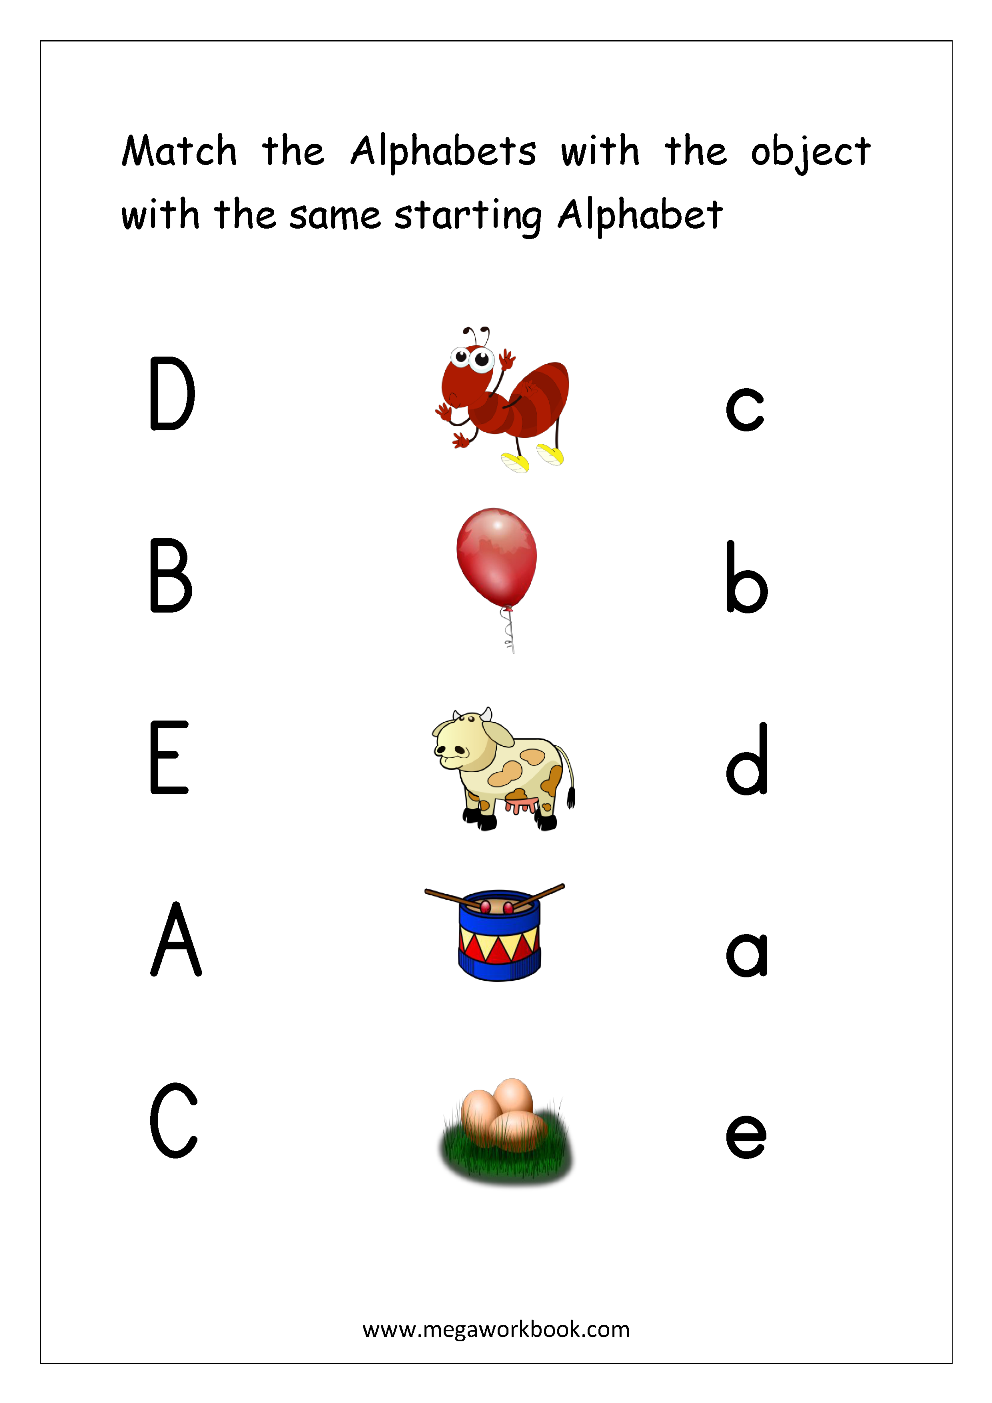 Free English Worksheets - Alphabet Matching - Megaworkbook regarding Alphabet Matching Worksheets Printable